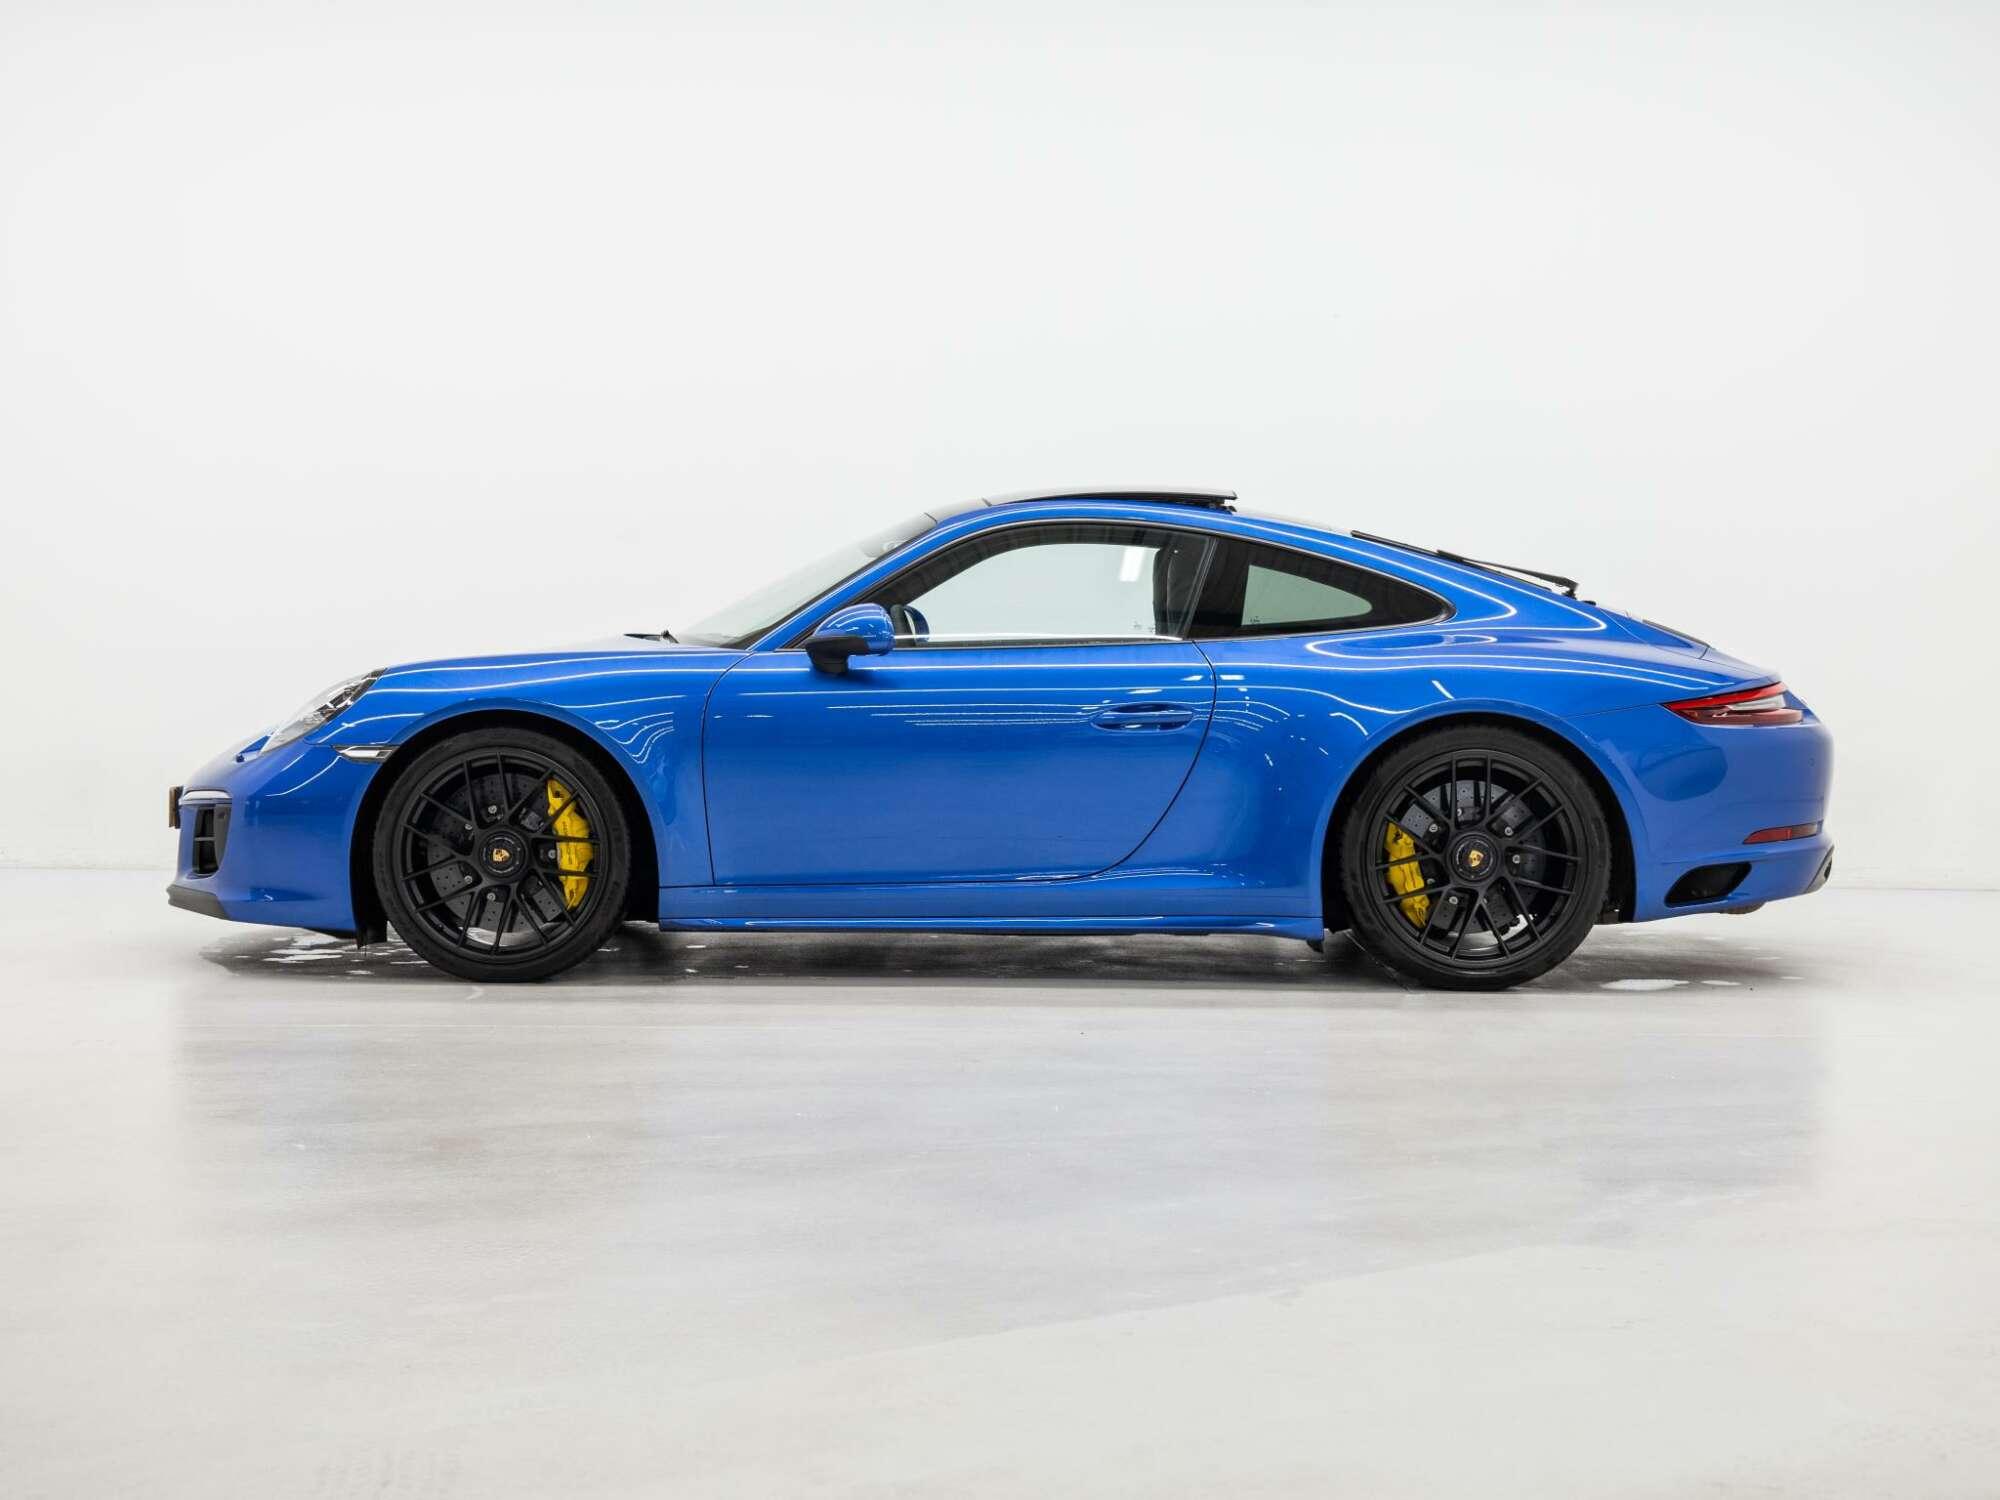 Porsche 991.2 Carrera 4 GTS